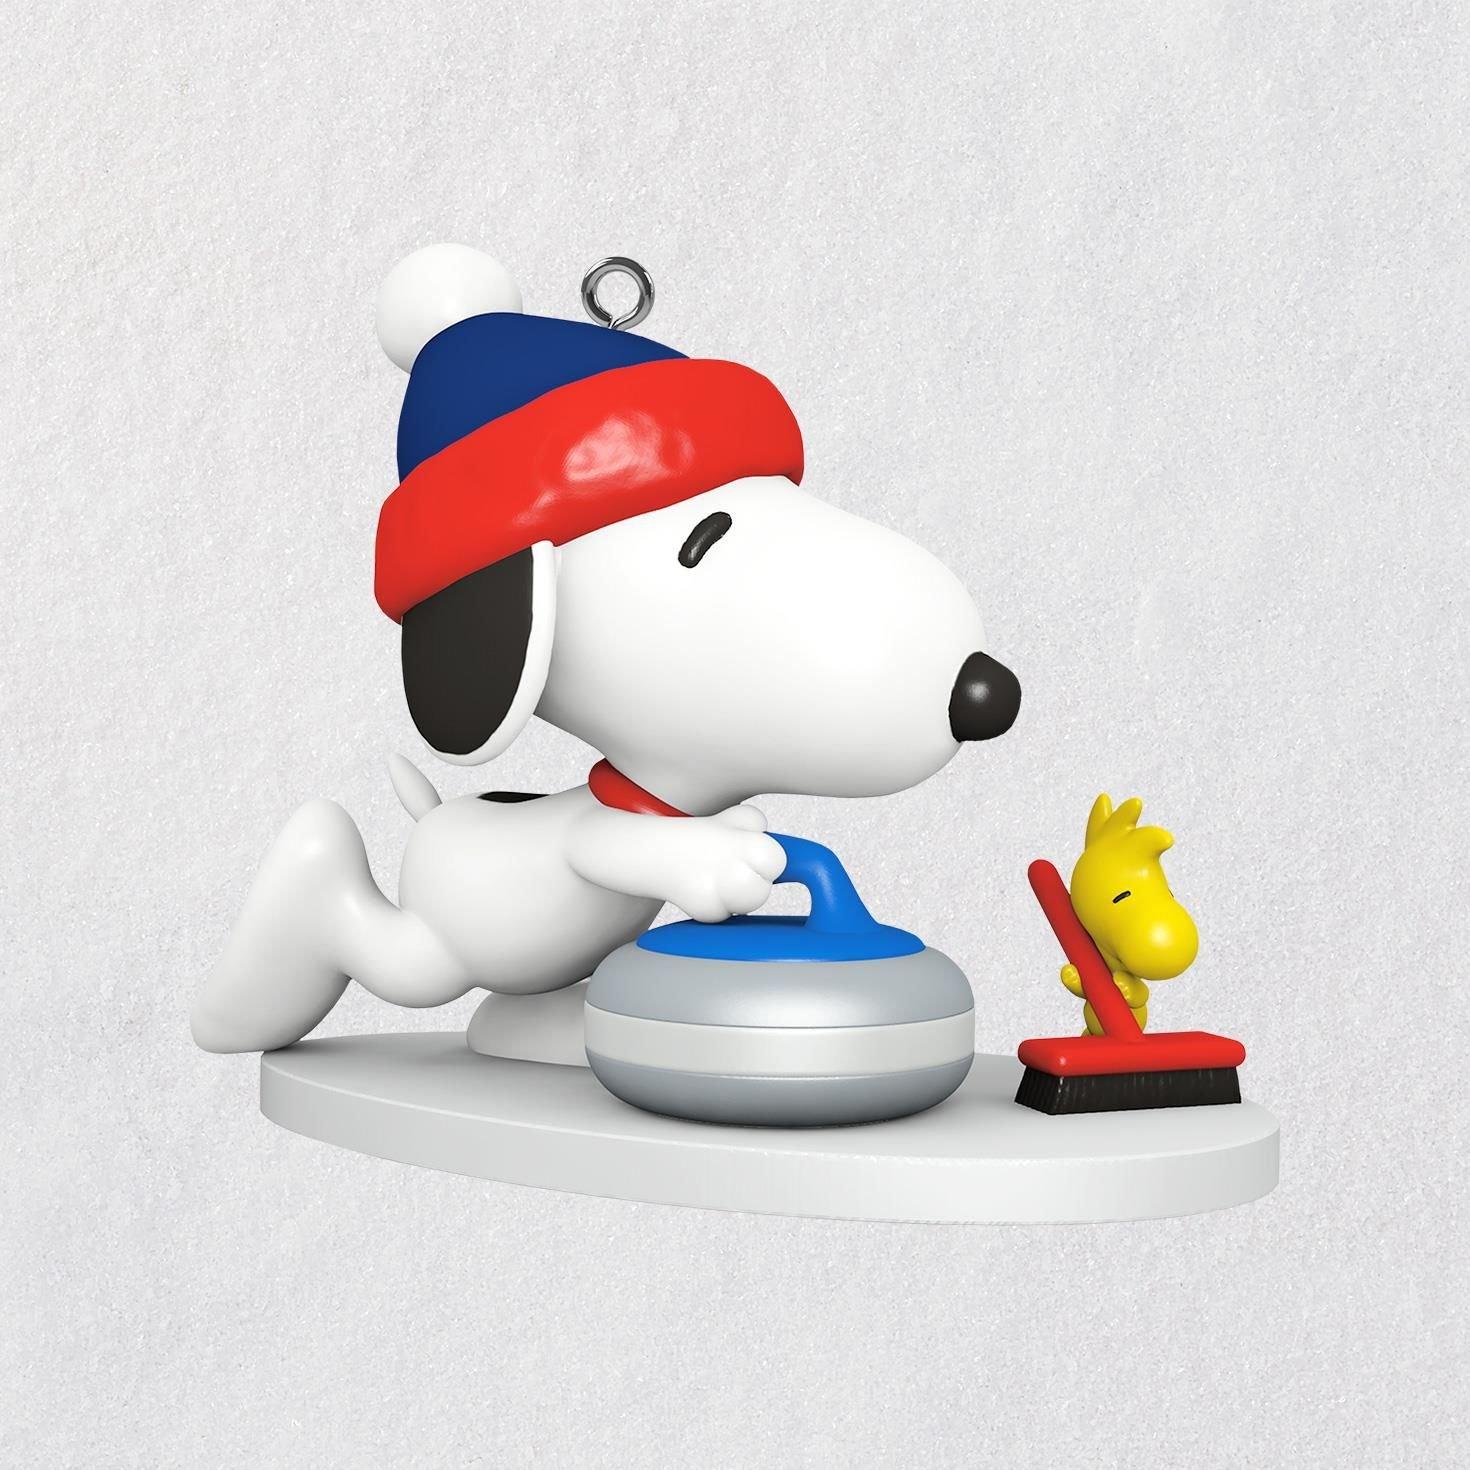 Hallmark Keepsake Mini Christmas Ornament 2018 Year Dated, Peanuts Snoopy Winter Fun and Games Curling Miniature, 1''